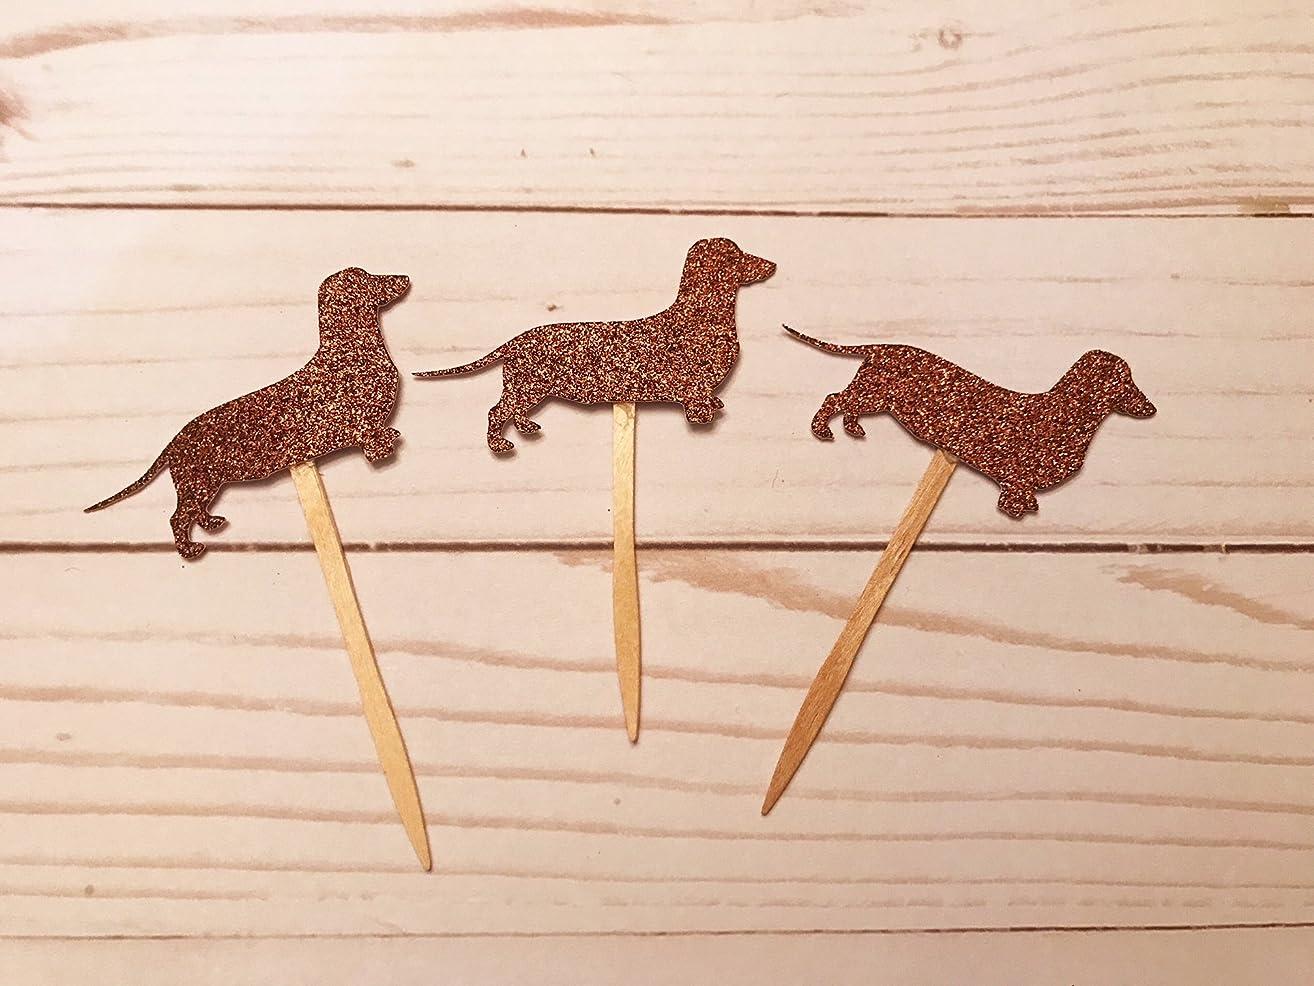 Dachshund cupcake toppers, dachshund cupcake topper, dachshund party decorations, dog cupcake toppers, dog party decor, hotdog cupcake